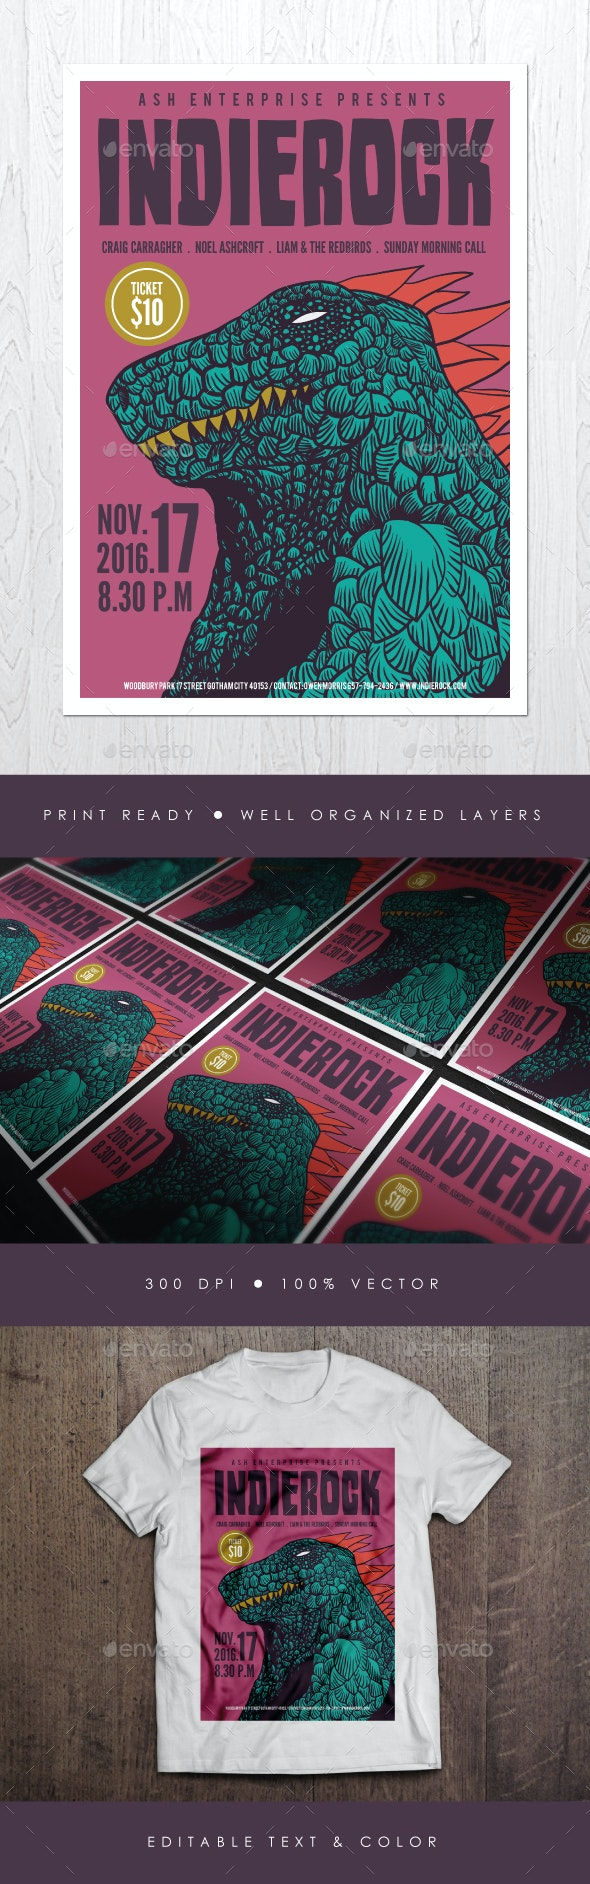 Indie Rock Vol. 2 Flyer - Events Flyers